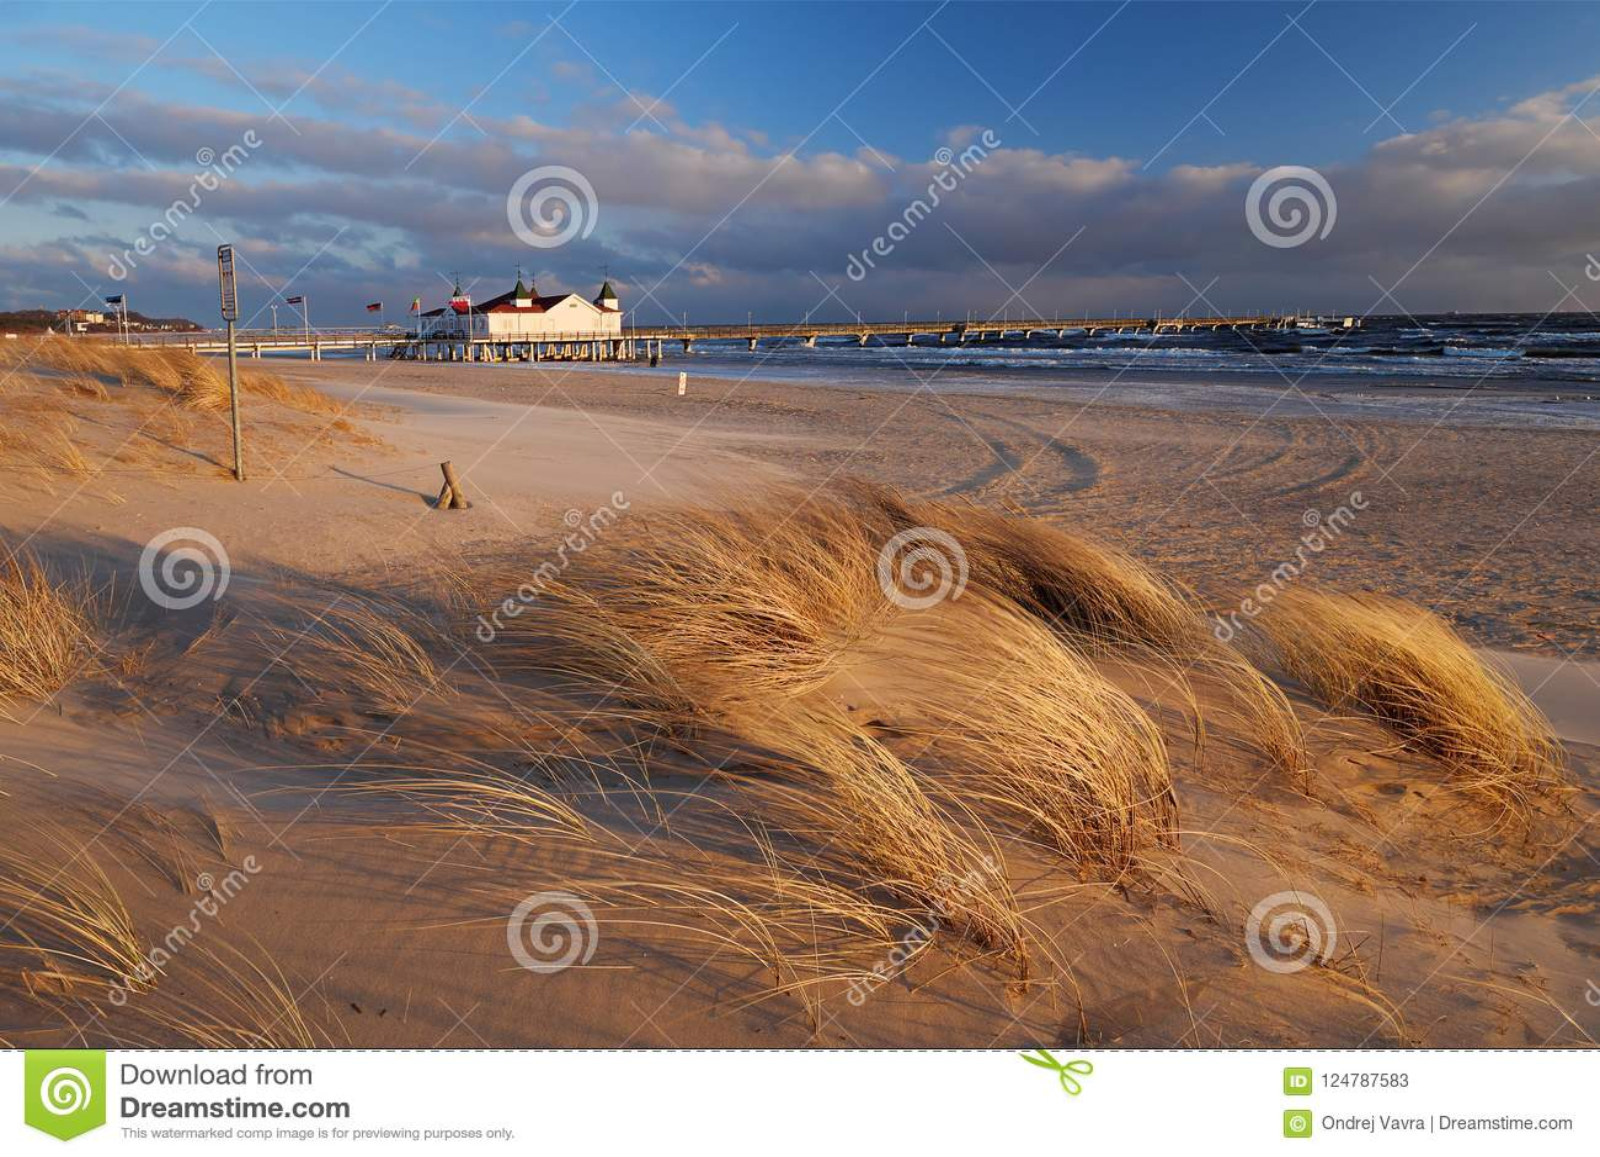 Strand in Ahlbeck, Usedom-Insel, Deutschland